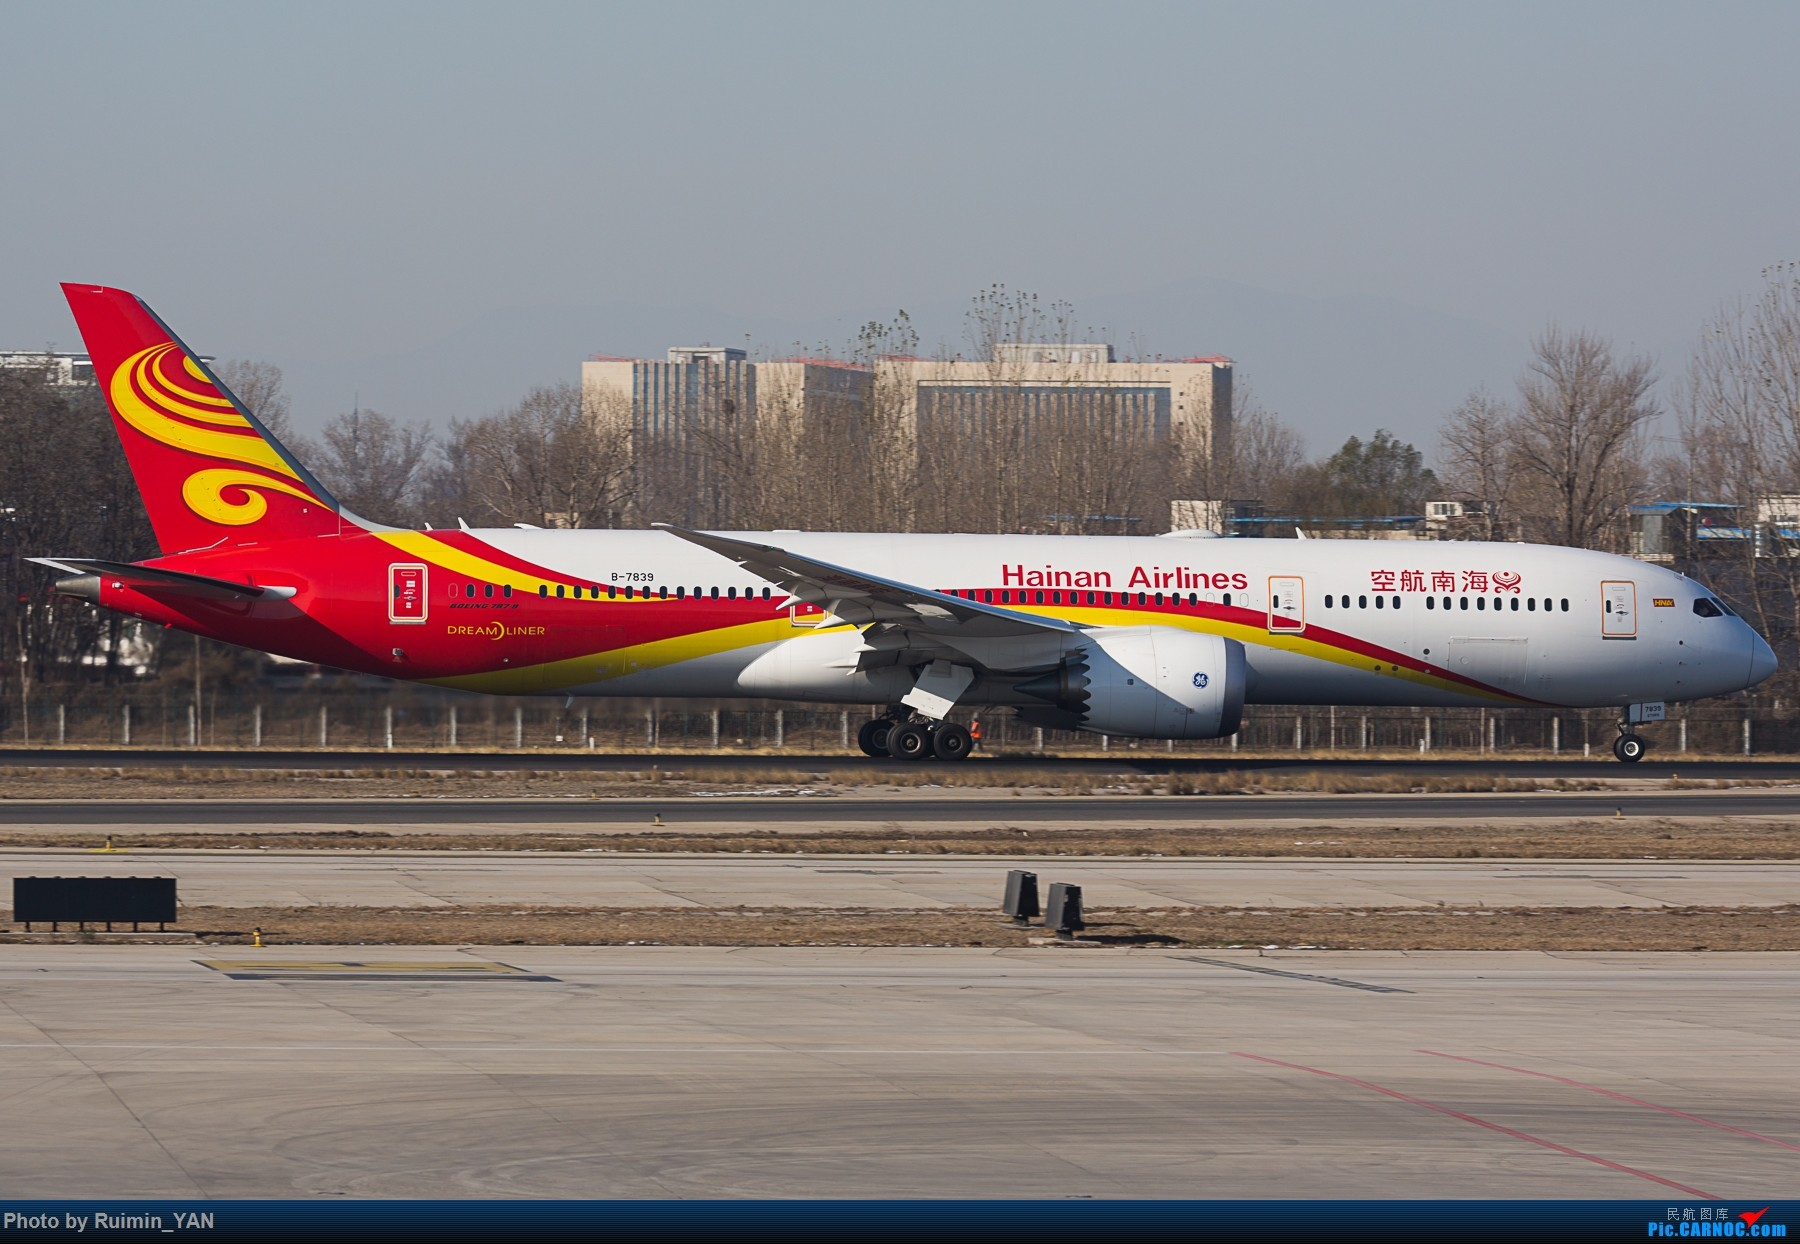 【PEK】36L跑道外附近火灾 海航 Boeing 787-9B-7839 BOEING 787-9 B-7839 中国北京首都国际机场